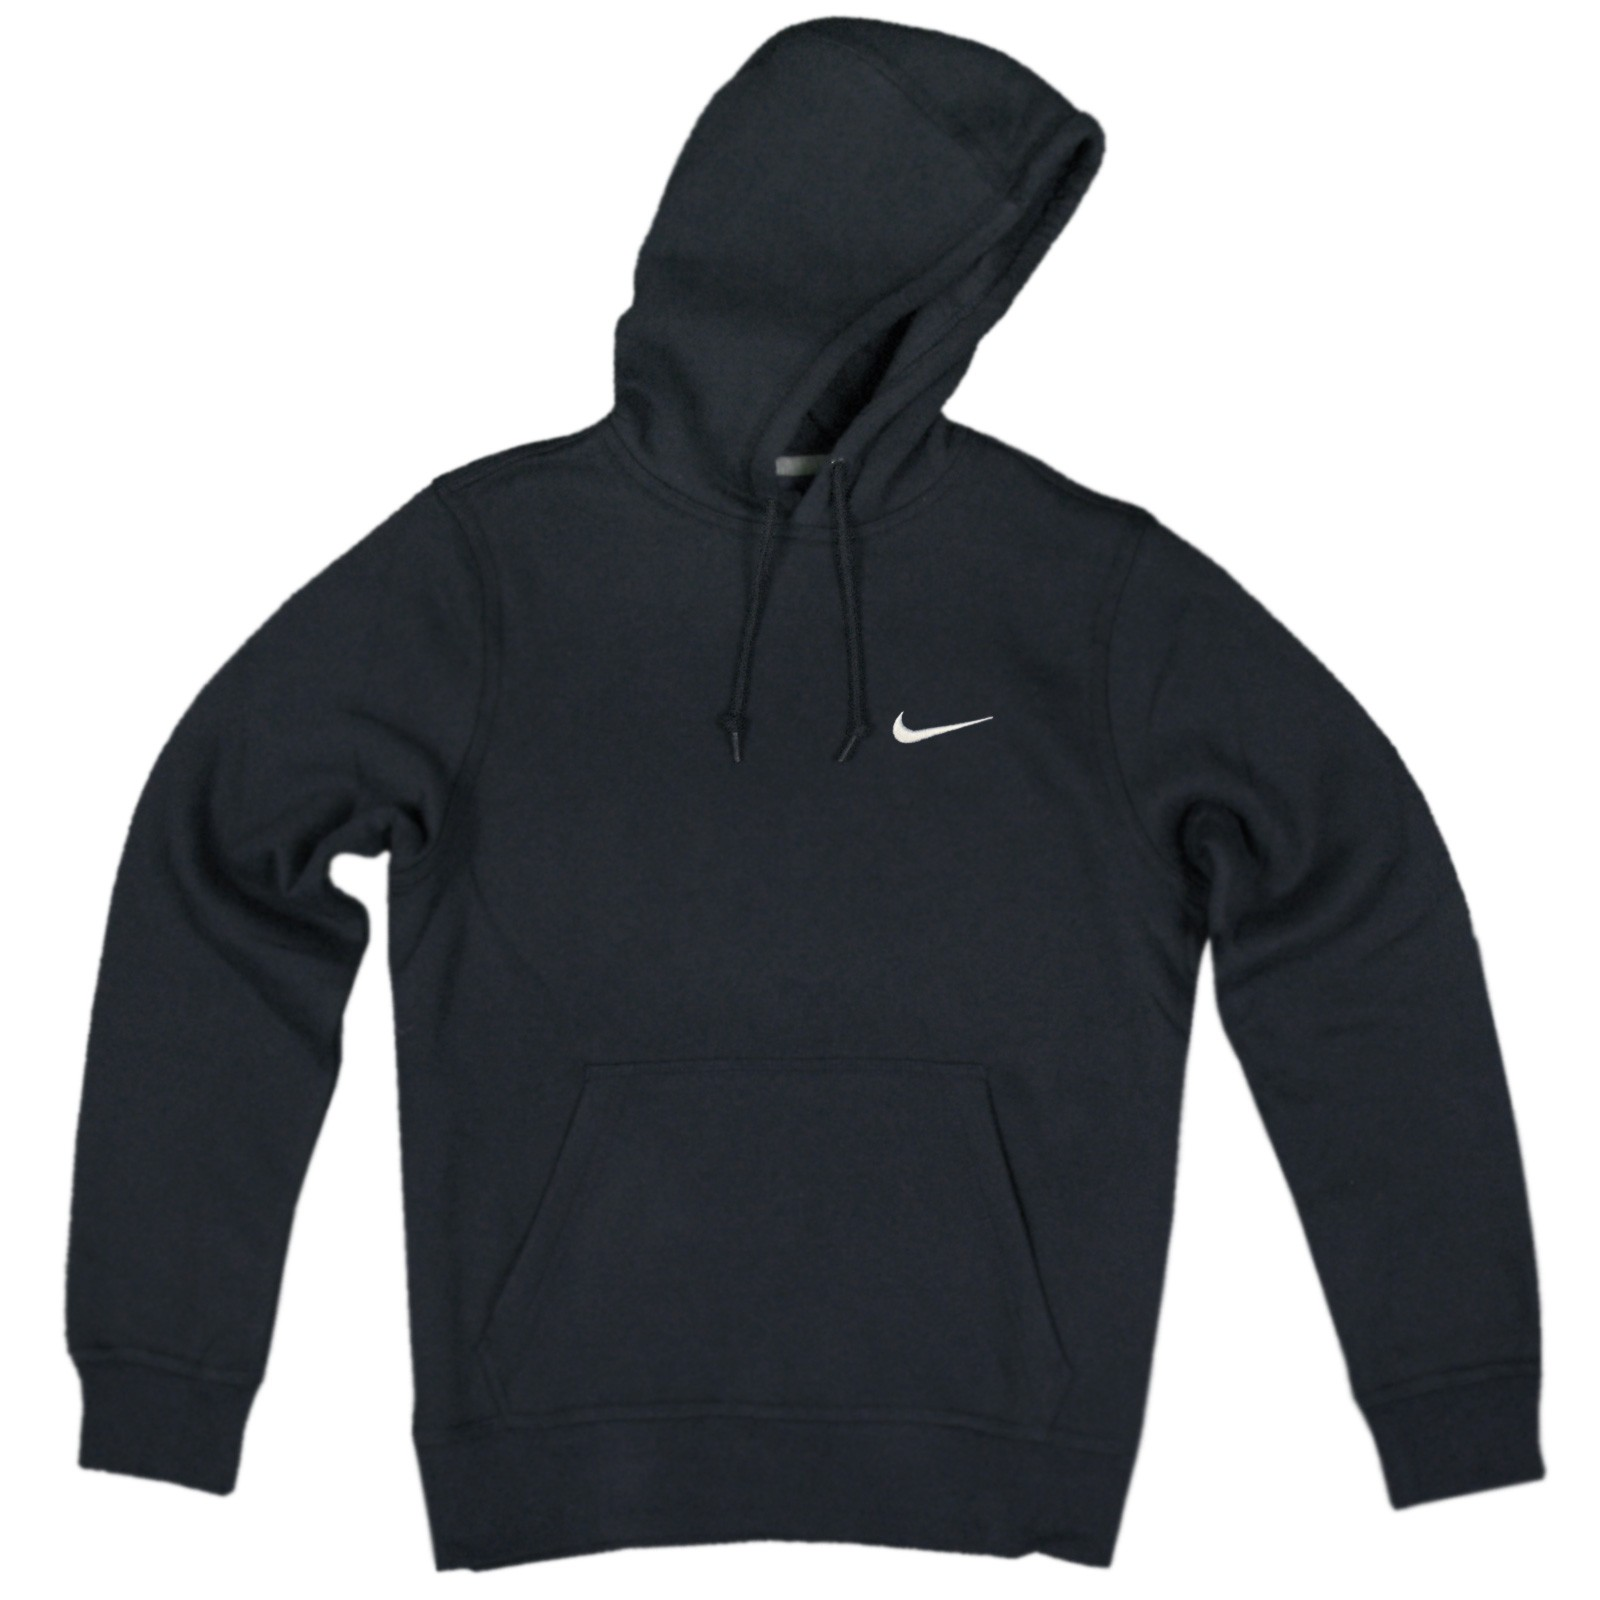 Détails sur Nike Logo swoosh Hoodie polaire capuche sweater Hoody  sweatshirt sweatjacke Bleu.